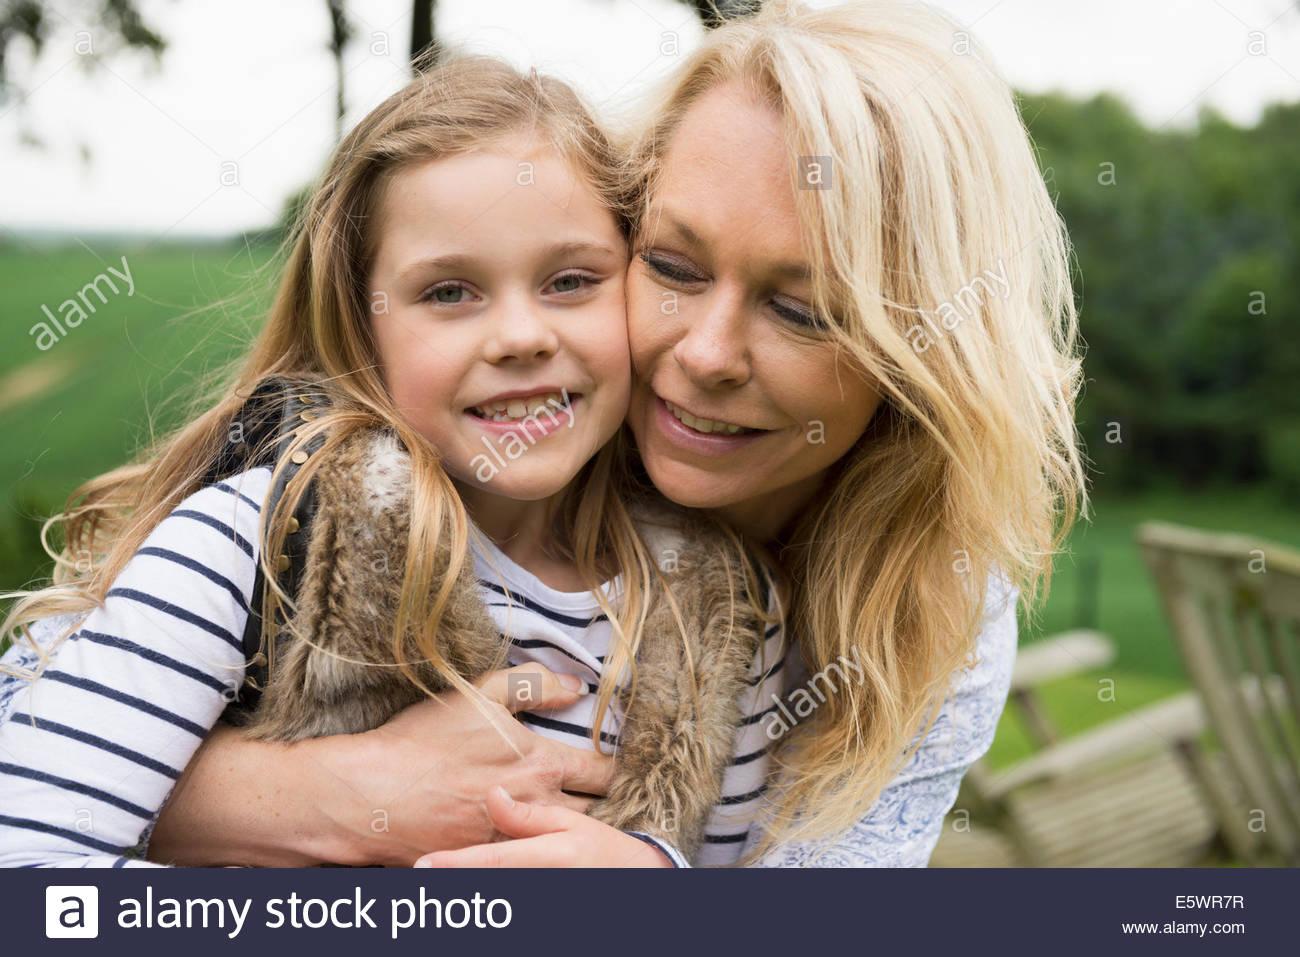 Mother hugging daughter, portrait - Stock Image